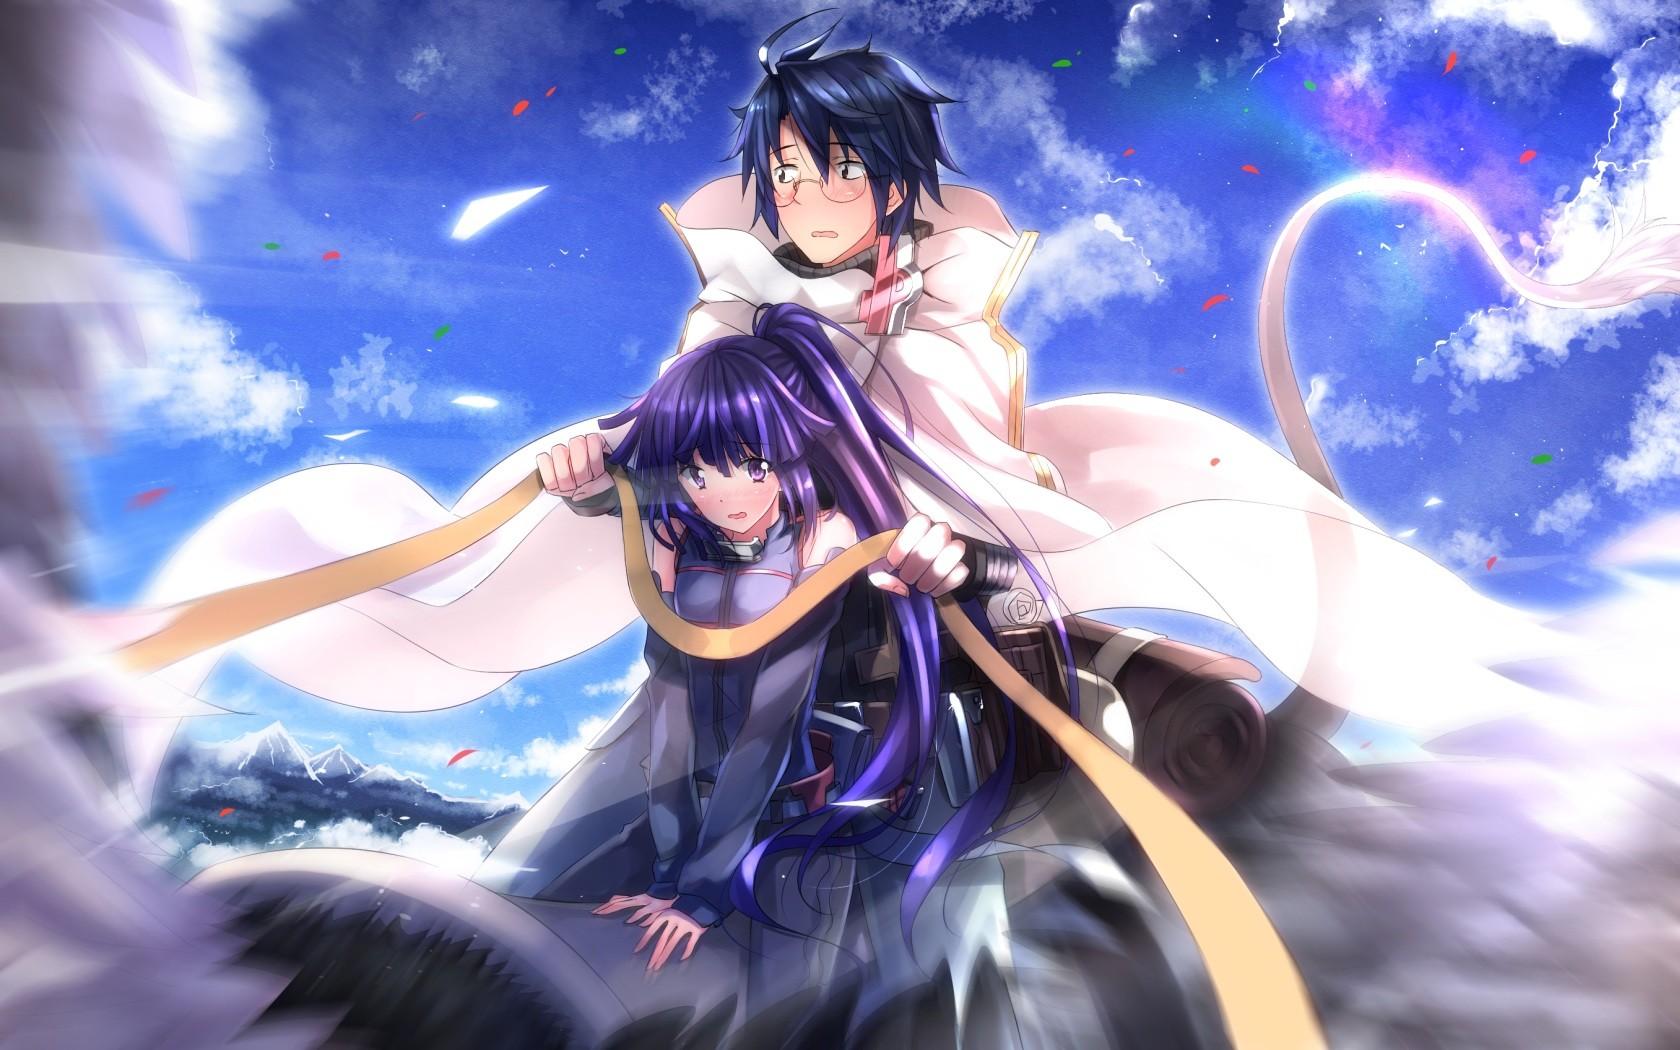 Wallpaper long hair anime girls anime boys glasses purple hair dark hair ponytail blushing log horizon purple eyes swordsouls mythology